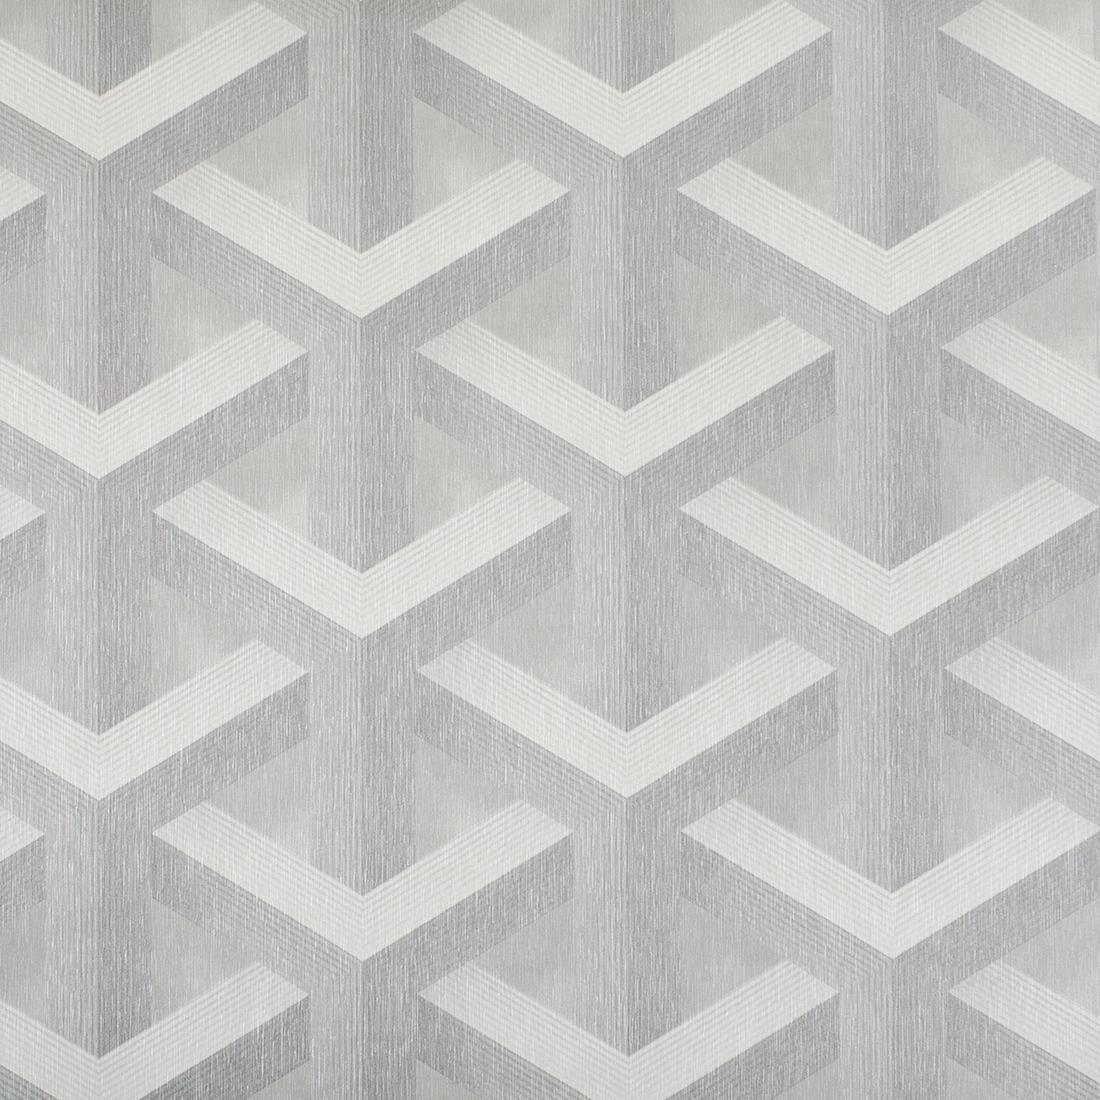 Papel de parede geom trico marvel stone pp187 1 r 175 - Papel autoadhesivo para paredes ...